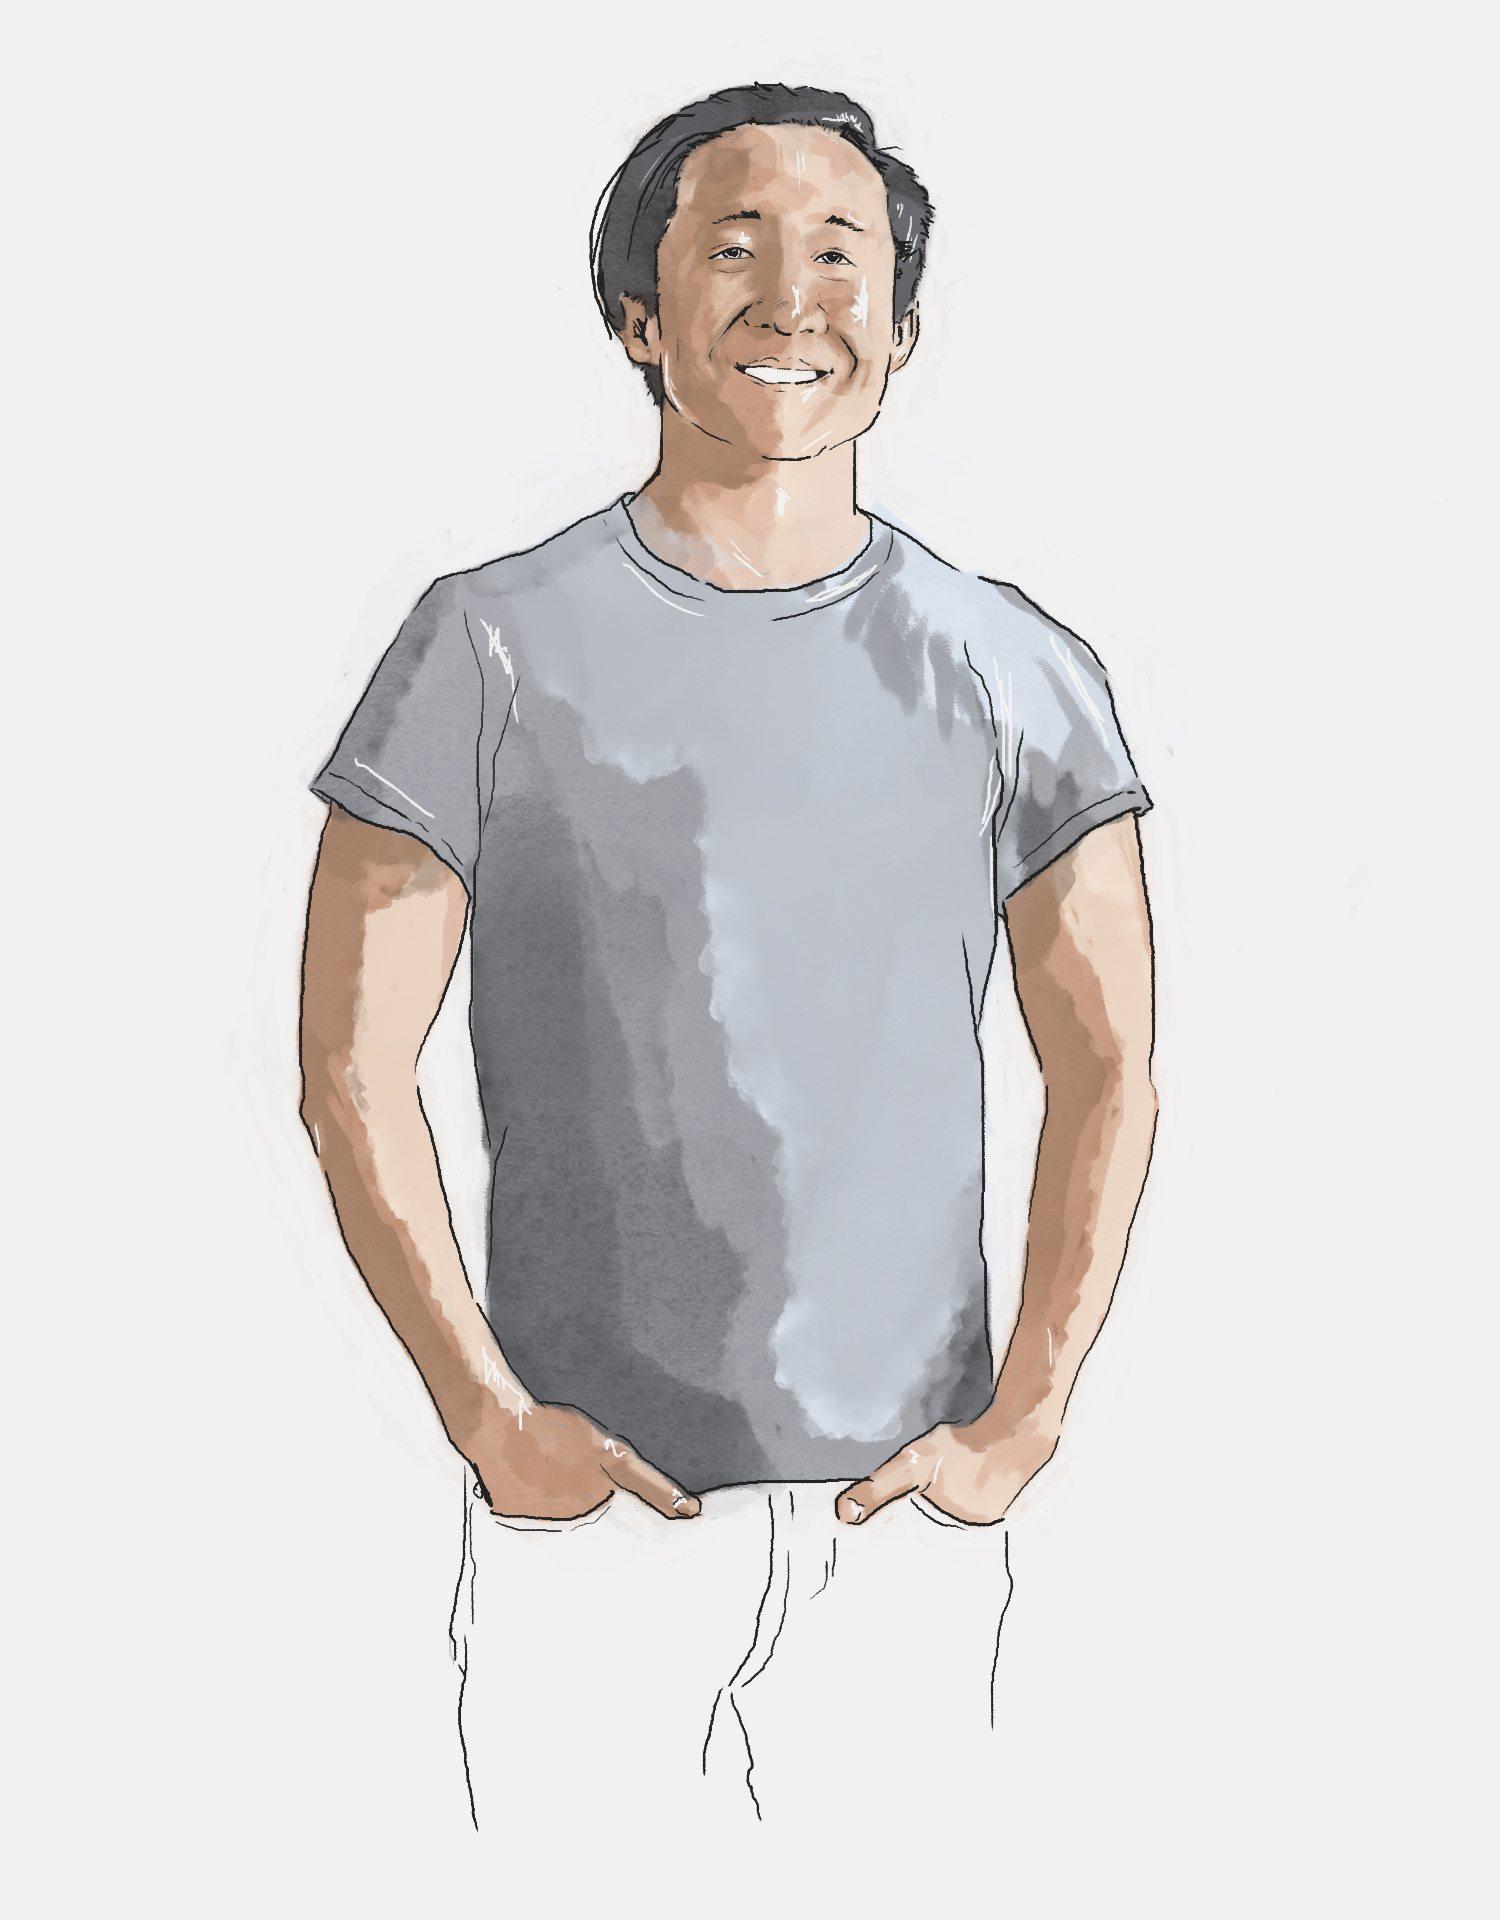 Austin Chu